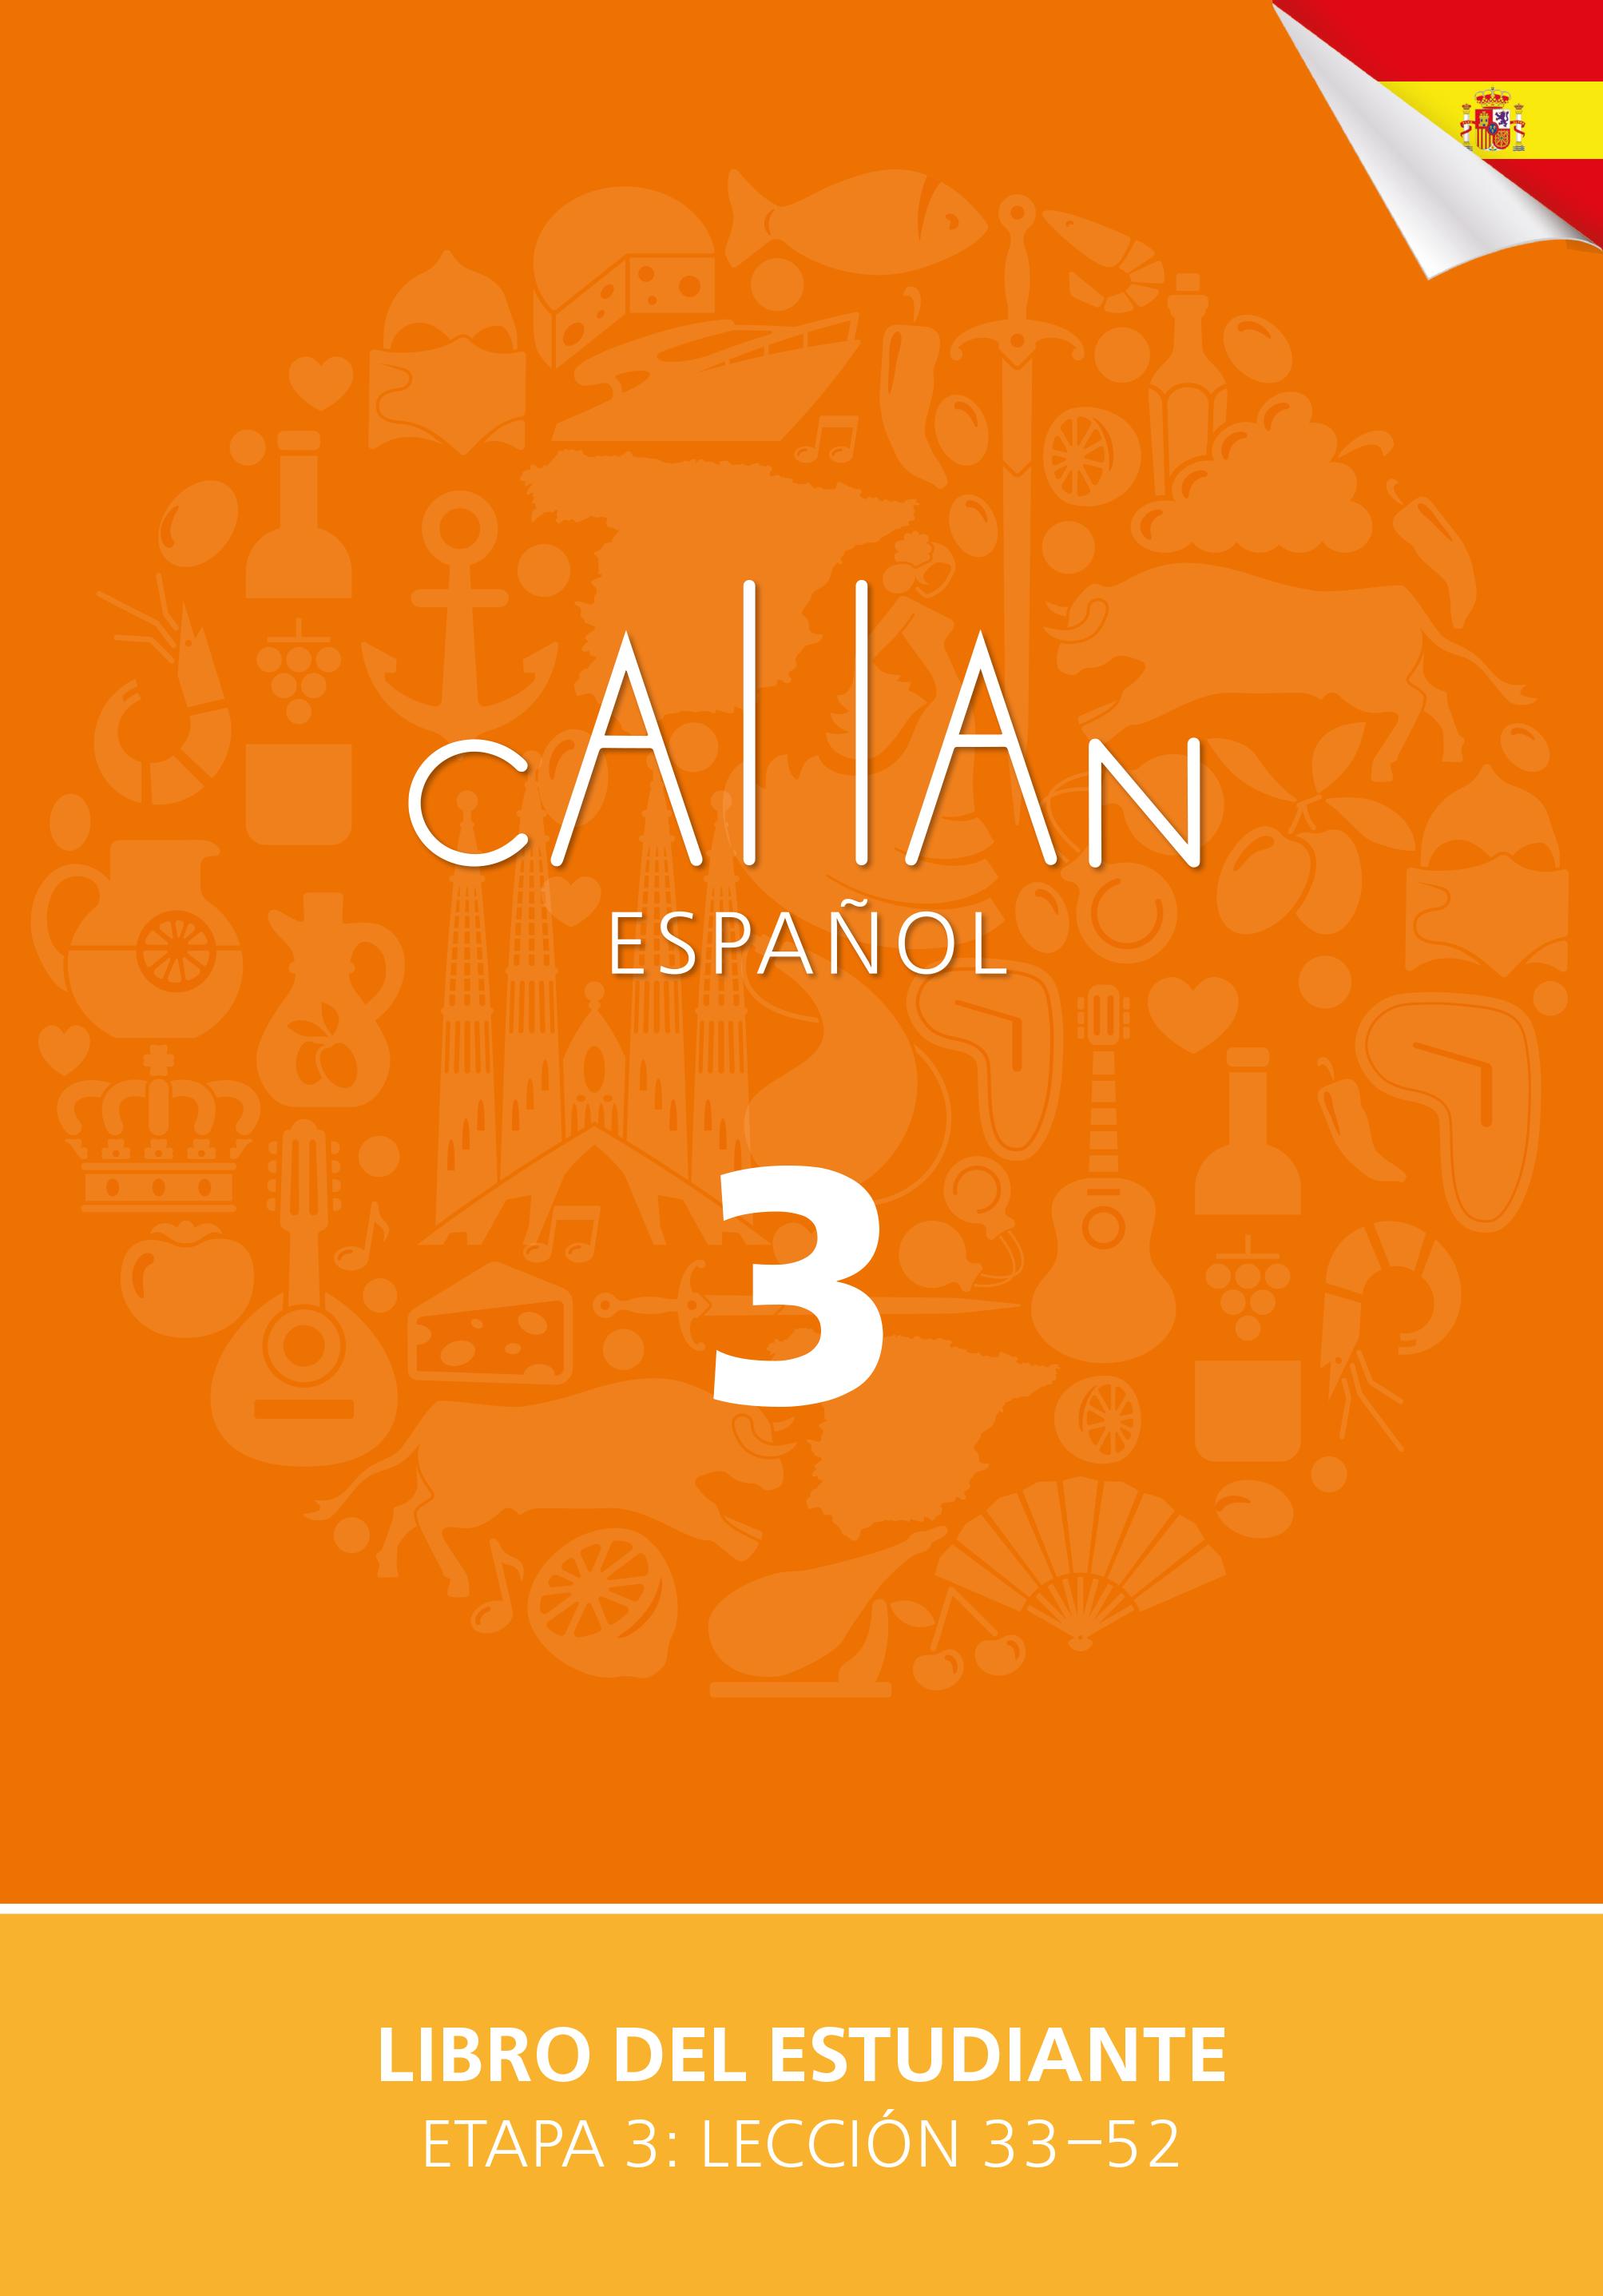 Callan shop callan method spanish ebook stage 3 callan method spanish ebook stage 3 fandeluxe Image collections